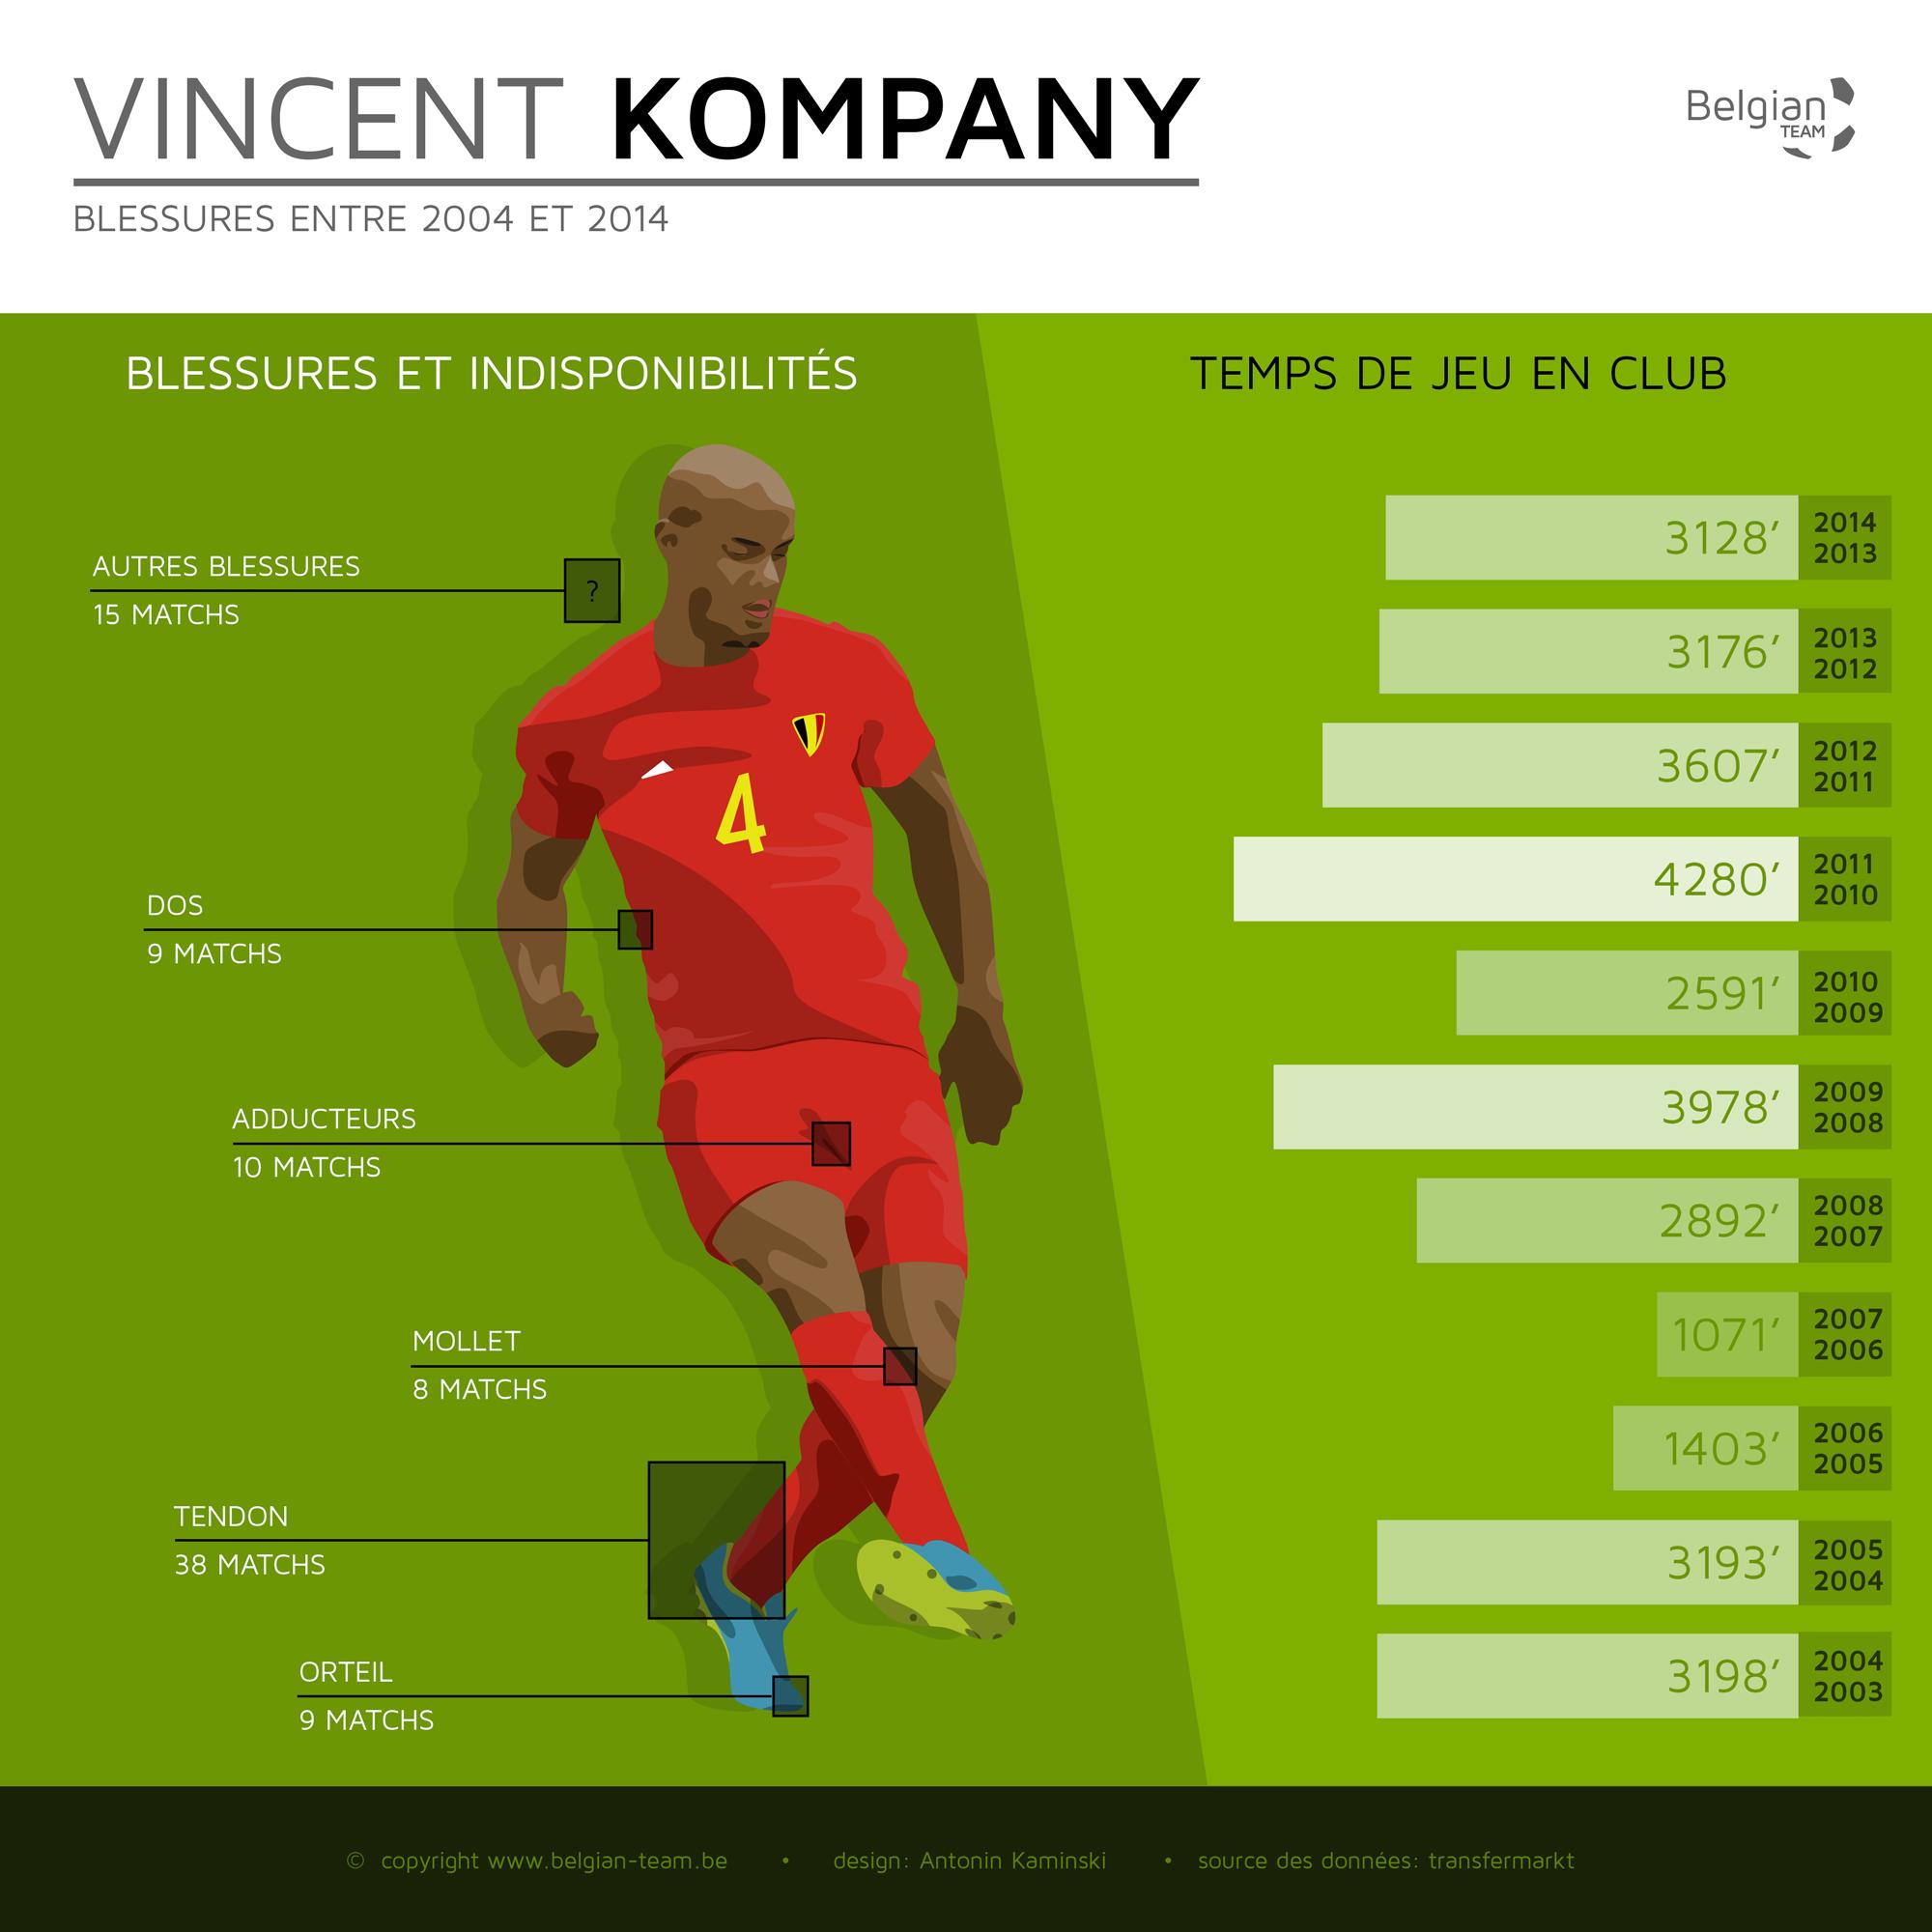 Infographie Vincent Kompany blessures